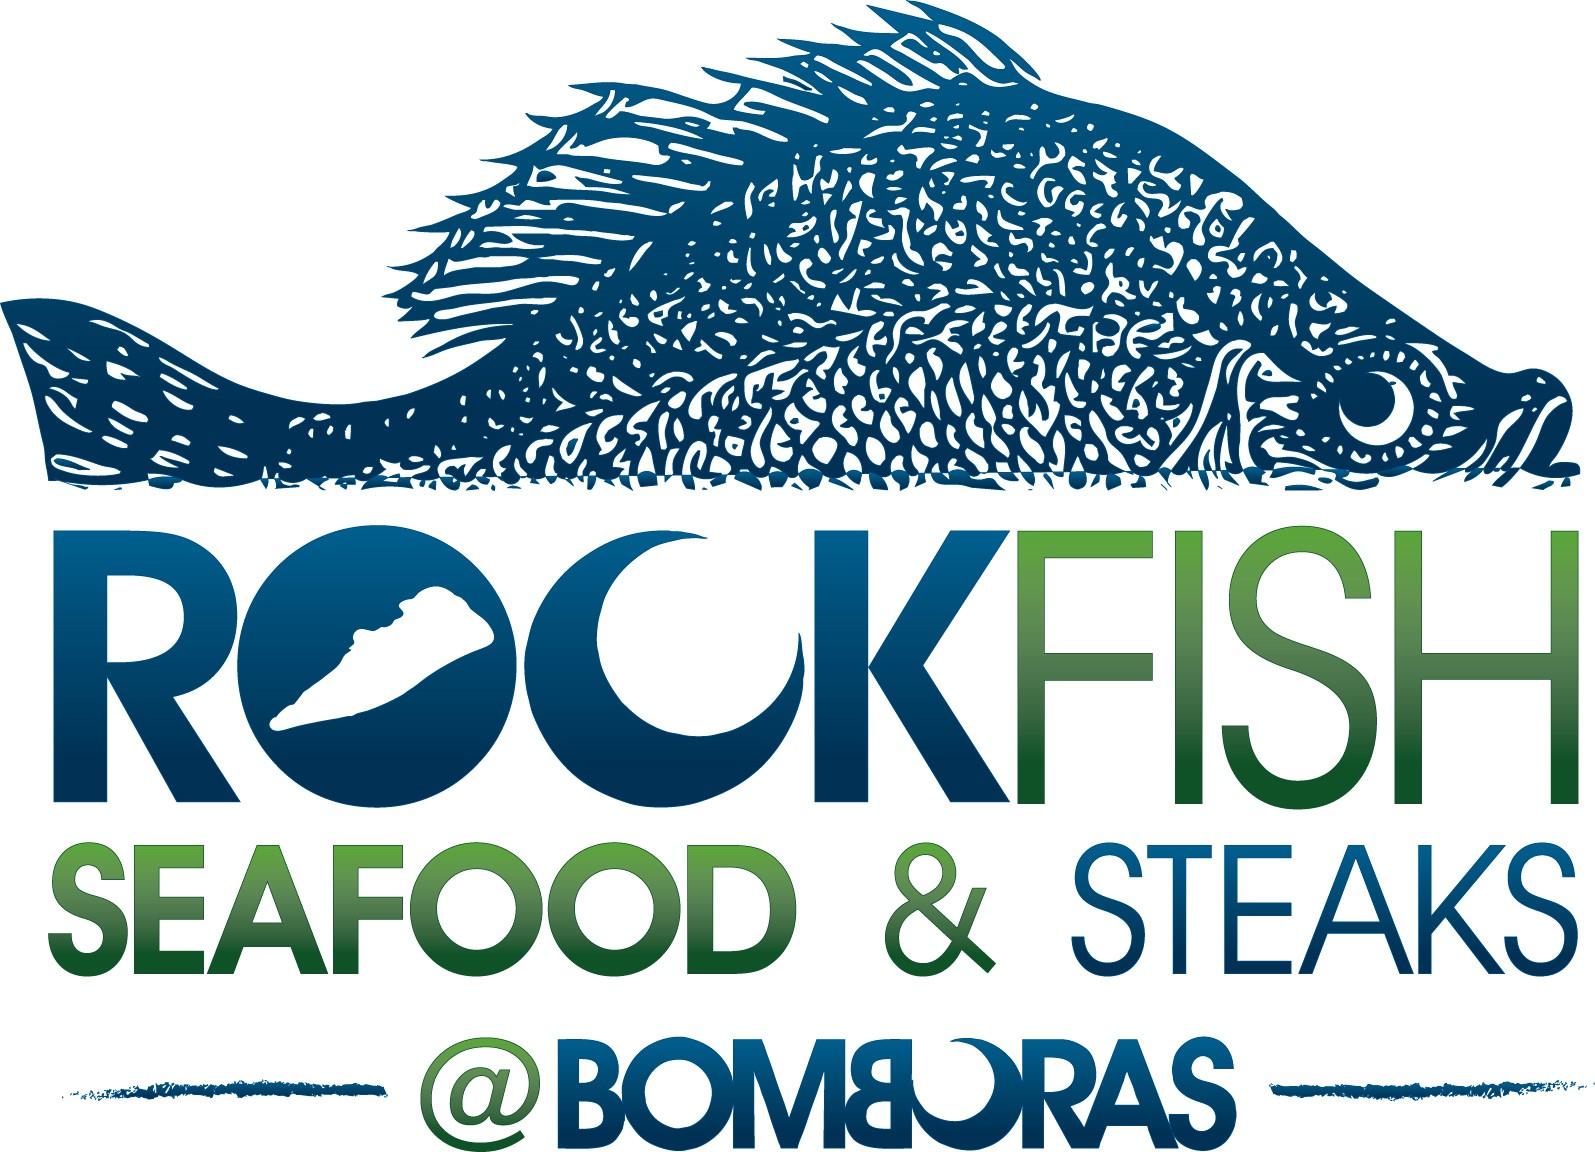 Rockfish Seafood and Steaks  - Fresh On The Menu